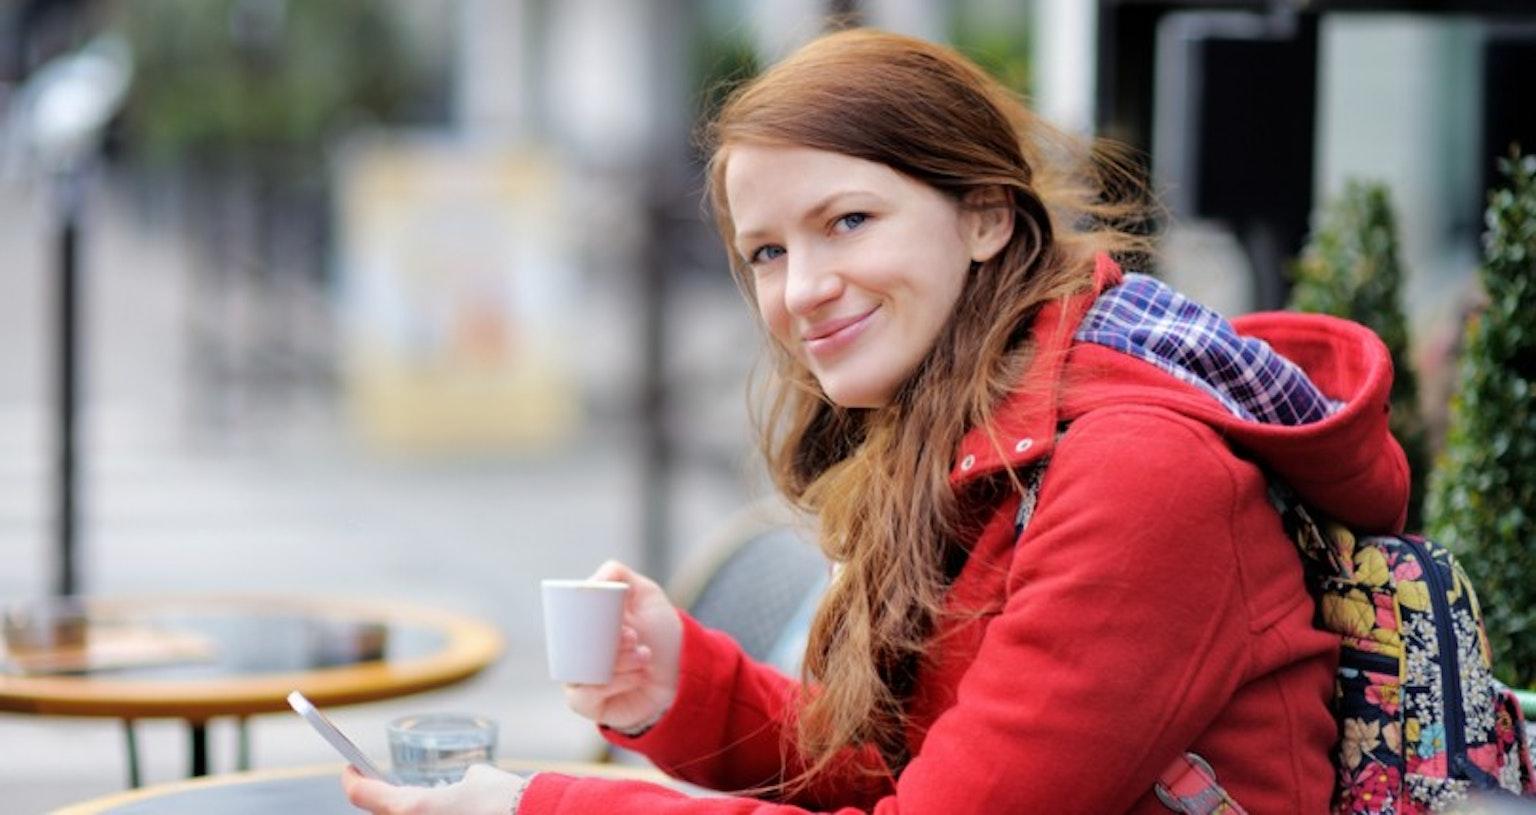 Girl smiling drinking coffee